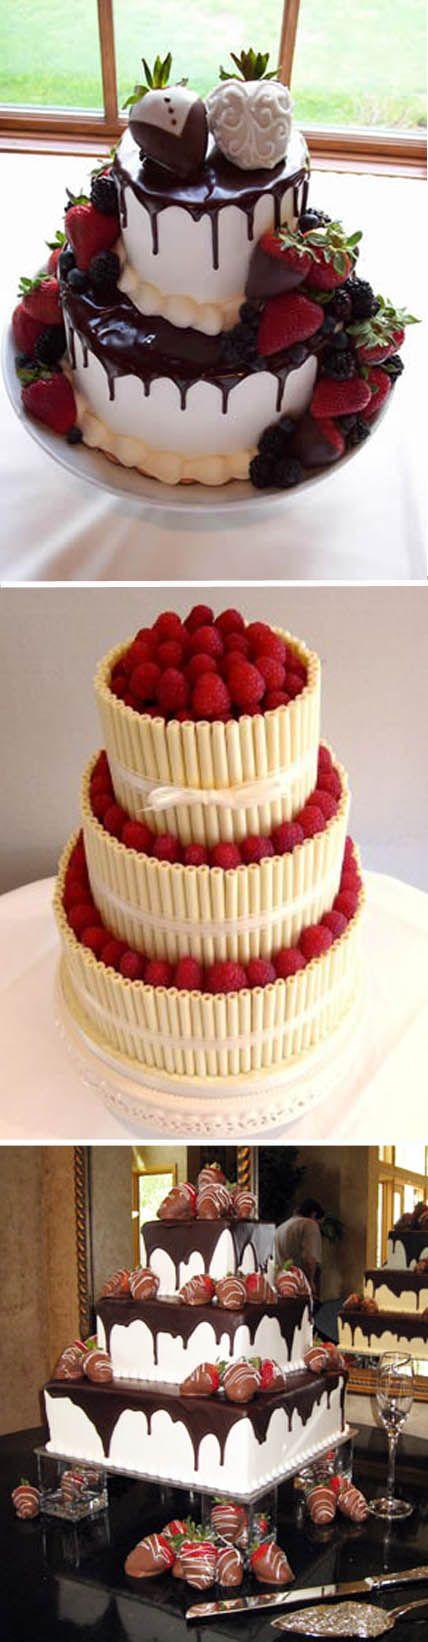 Strawberry Wedding Cakes